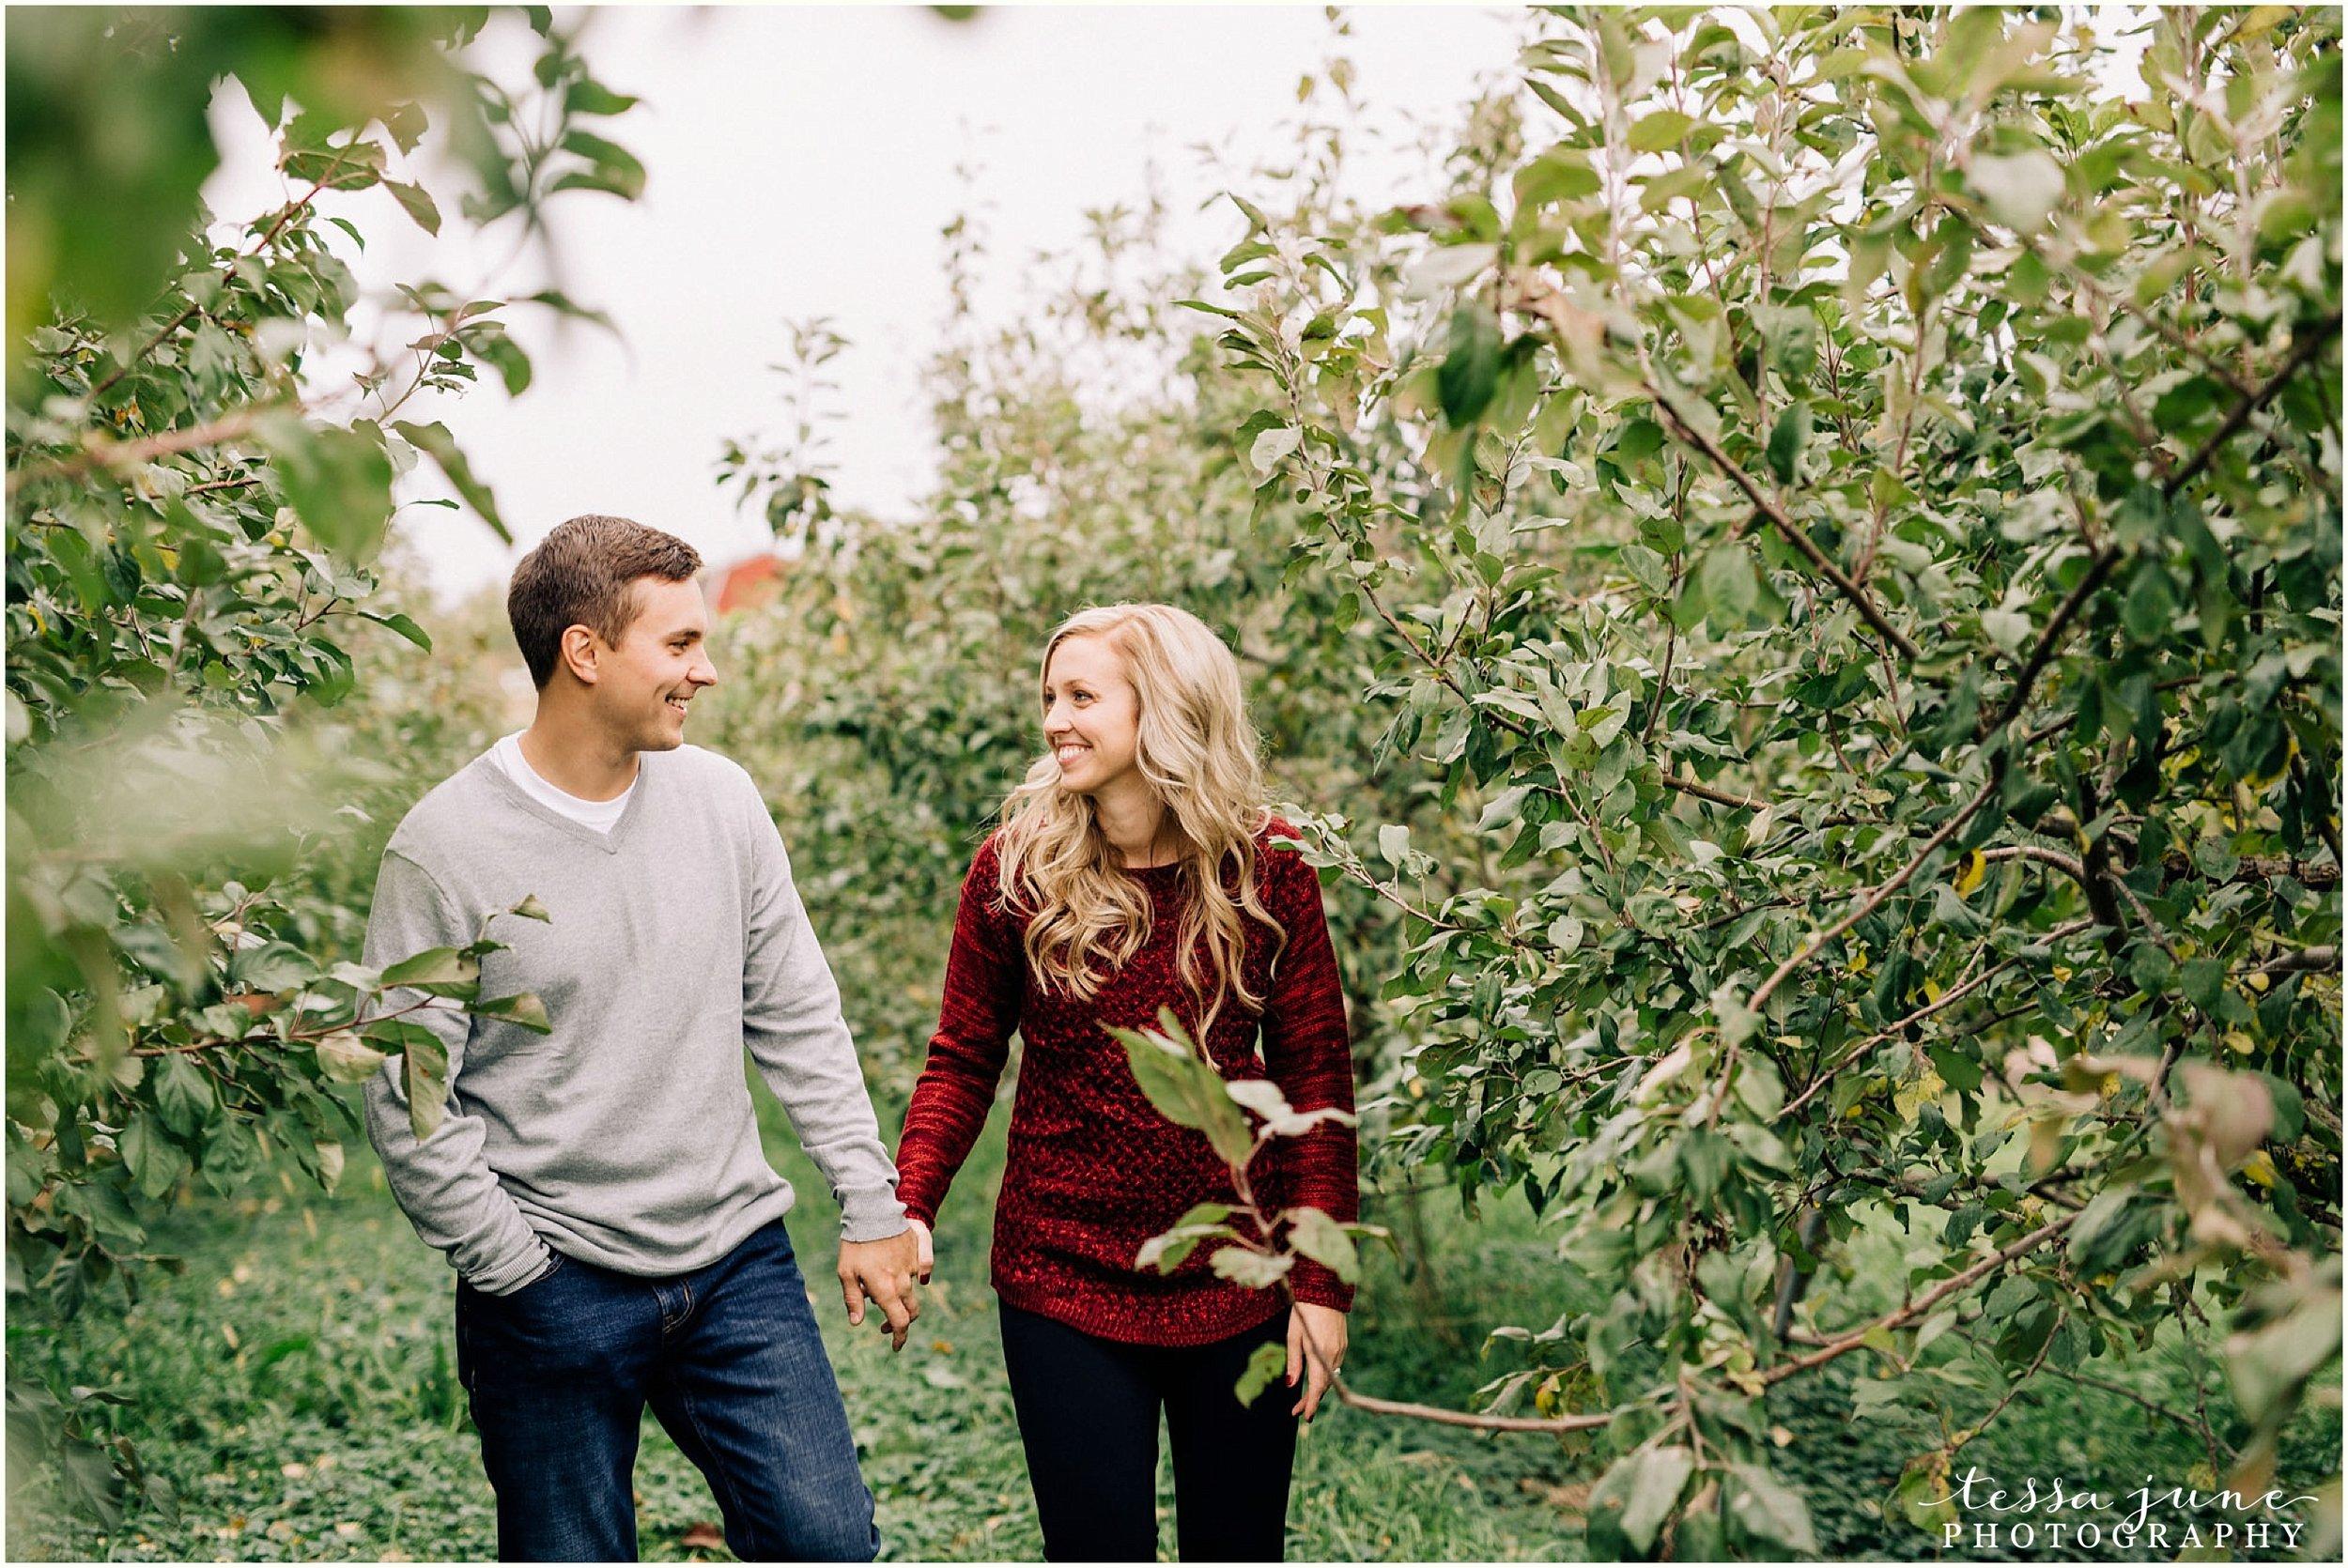 deer-lake-orchard-buffalo-minnesota-fall-engagement-st-cloud-photographer-8.jpg